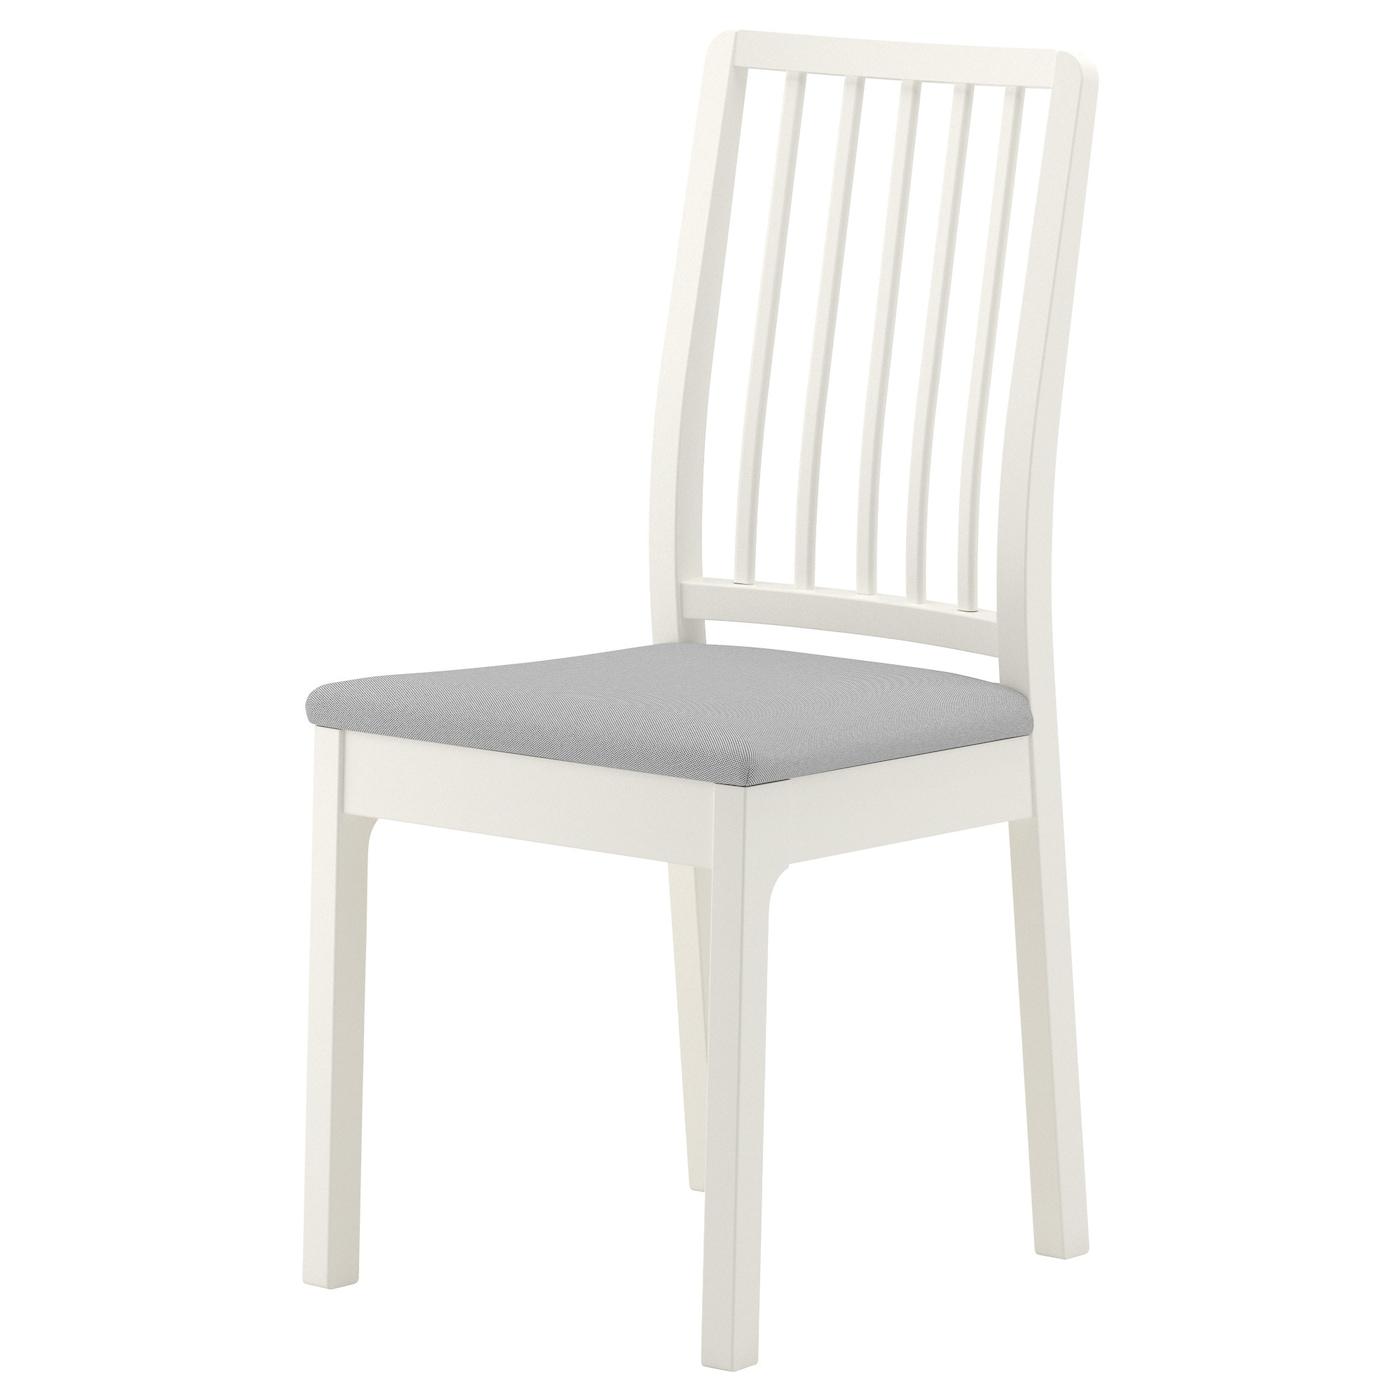 EKEDALEN Chair White/ramna light grey - IKEA